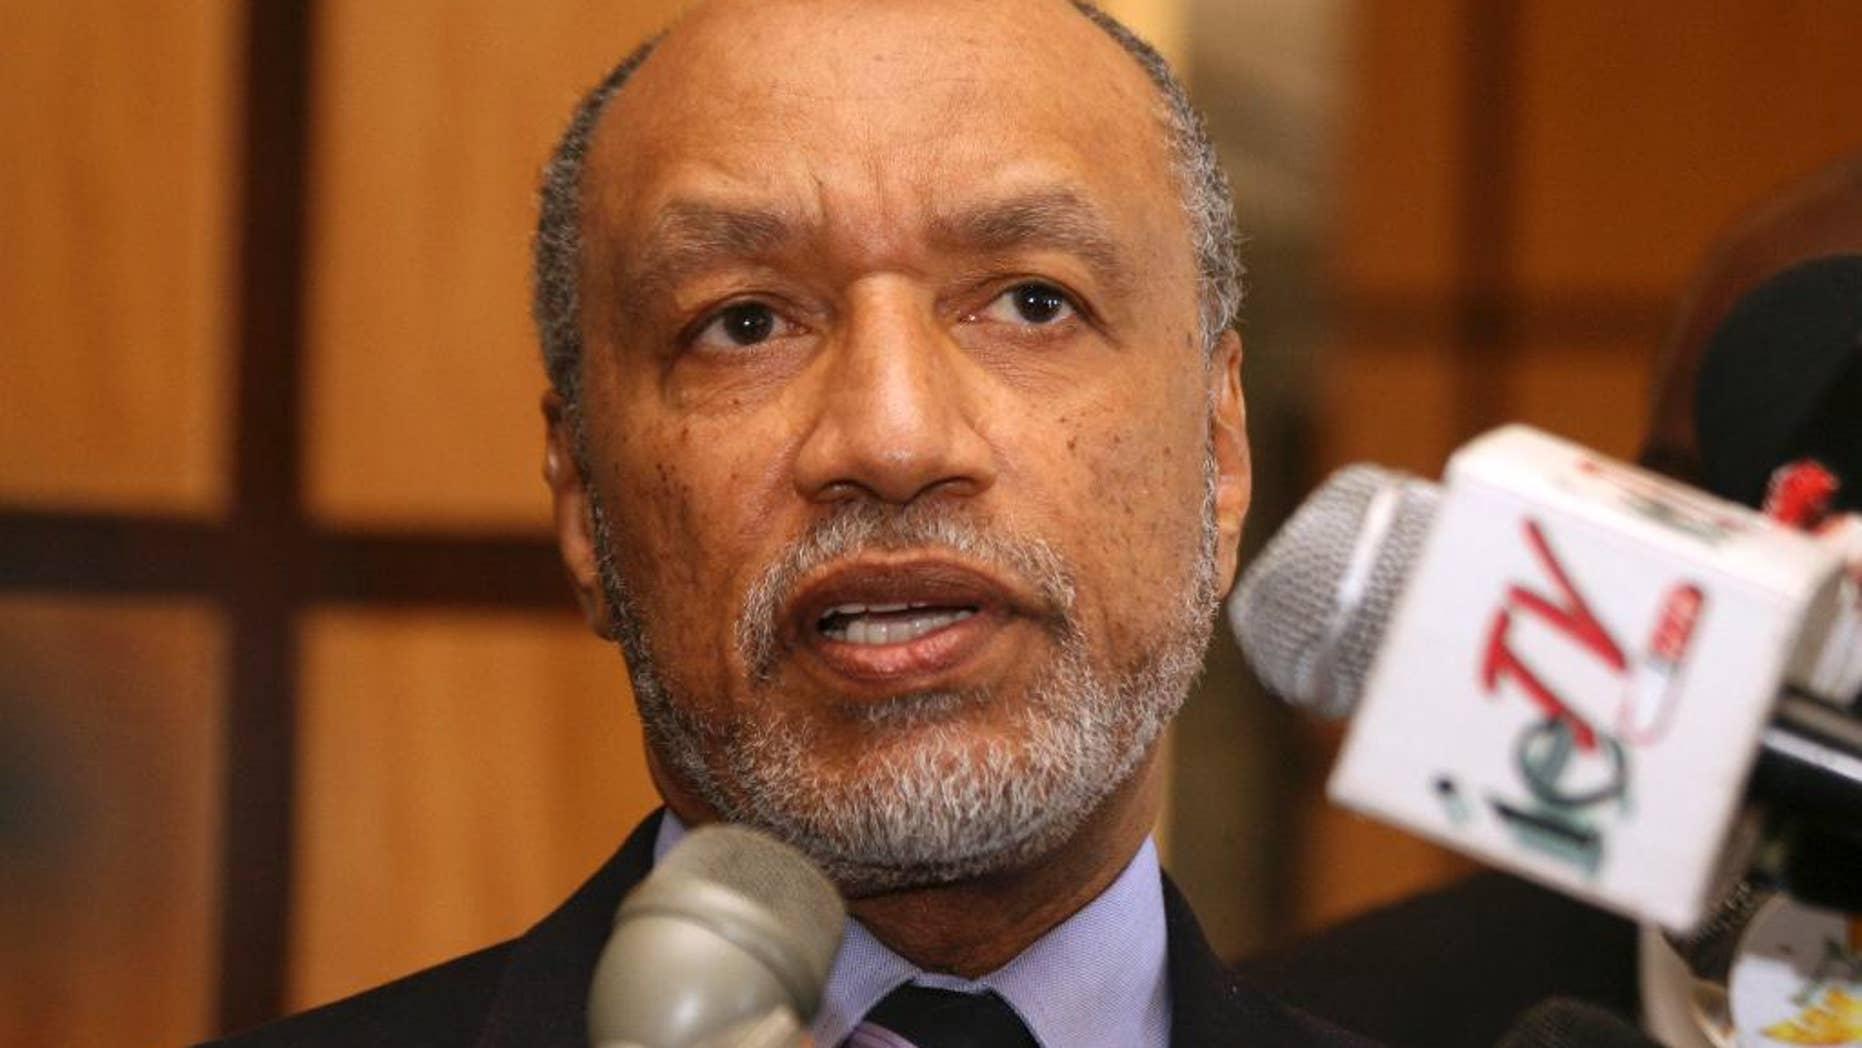 May 10, 2011: This photo shows former FIFA Vice President  Mohamed Bin Hammam (AP Photo/Shirley Bahadur, File)